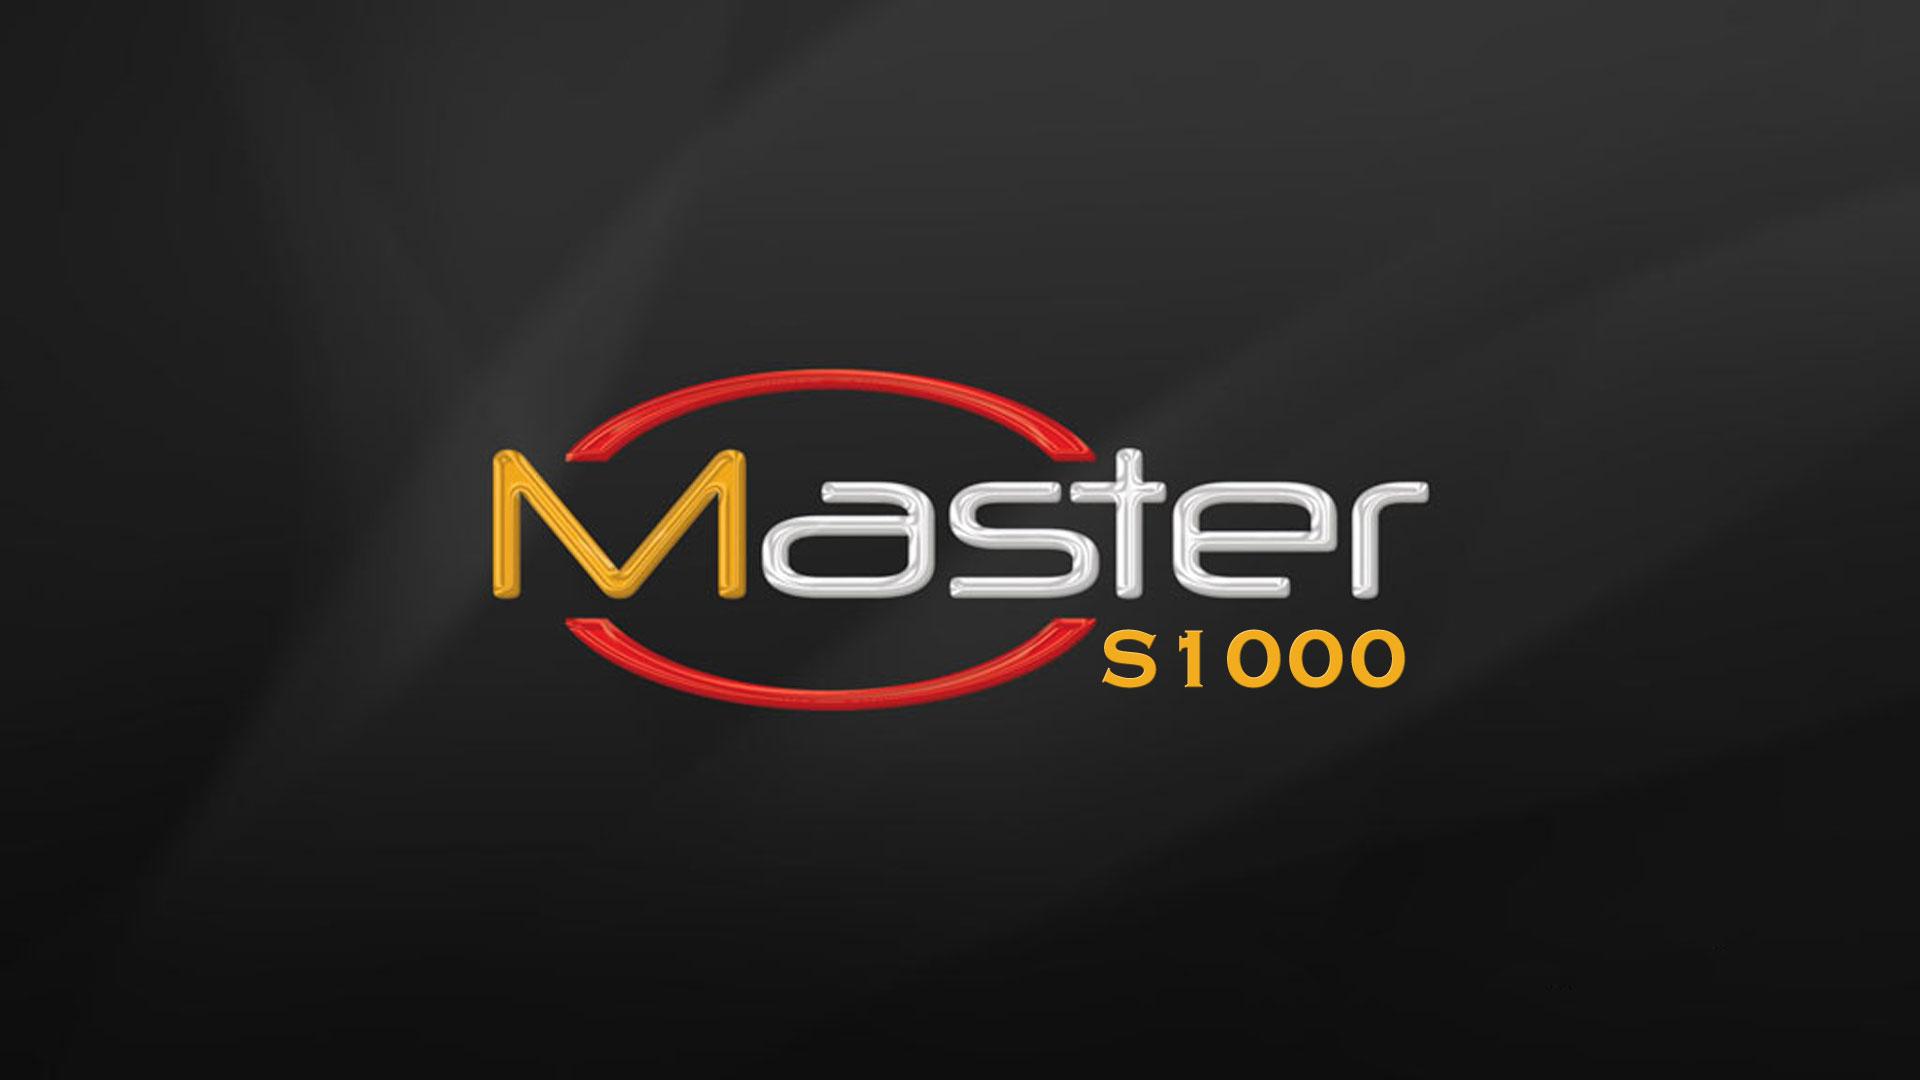 Software Master S1000 TGX140 Update Firmware Receiver